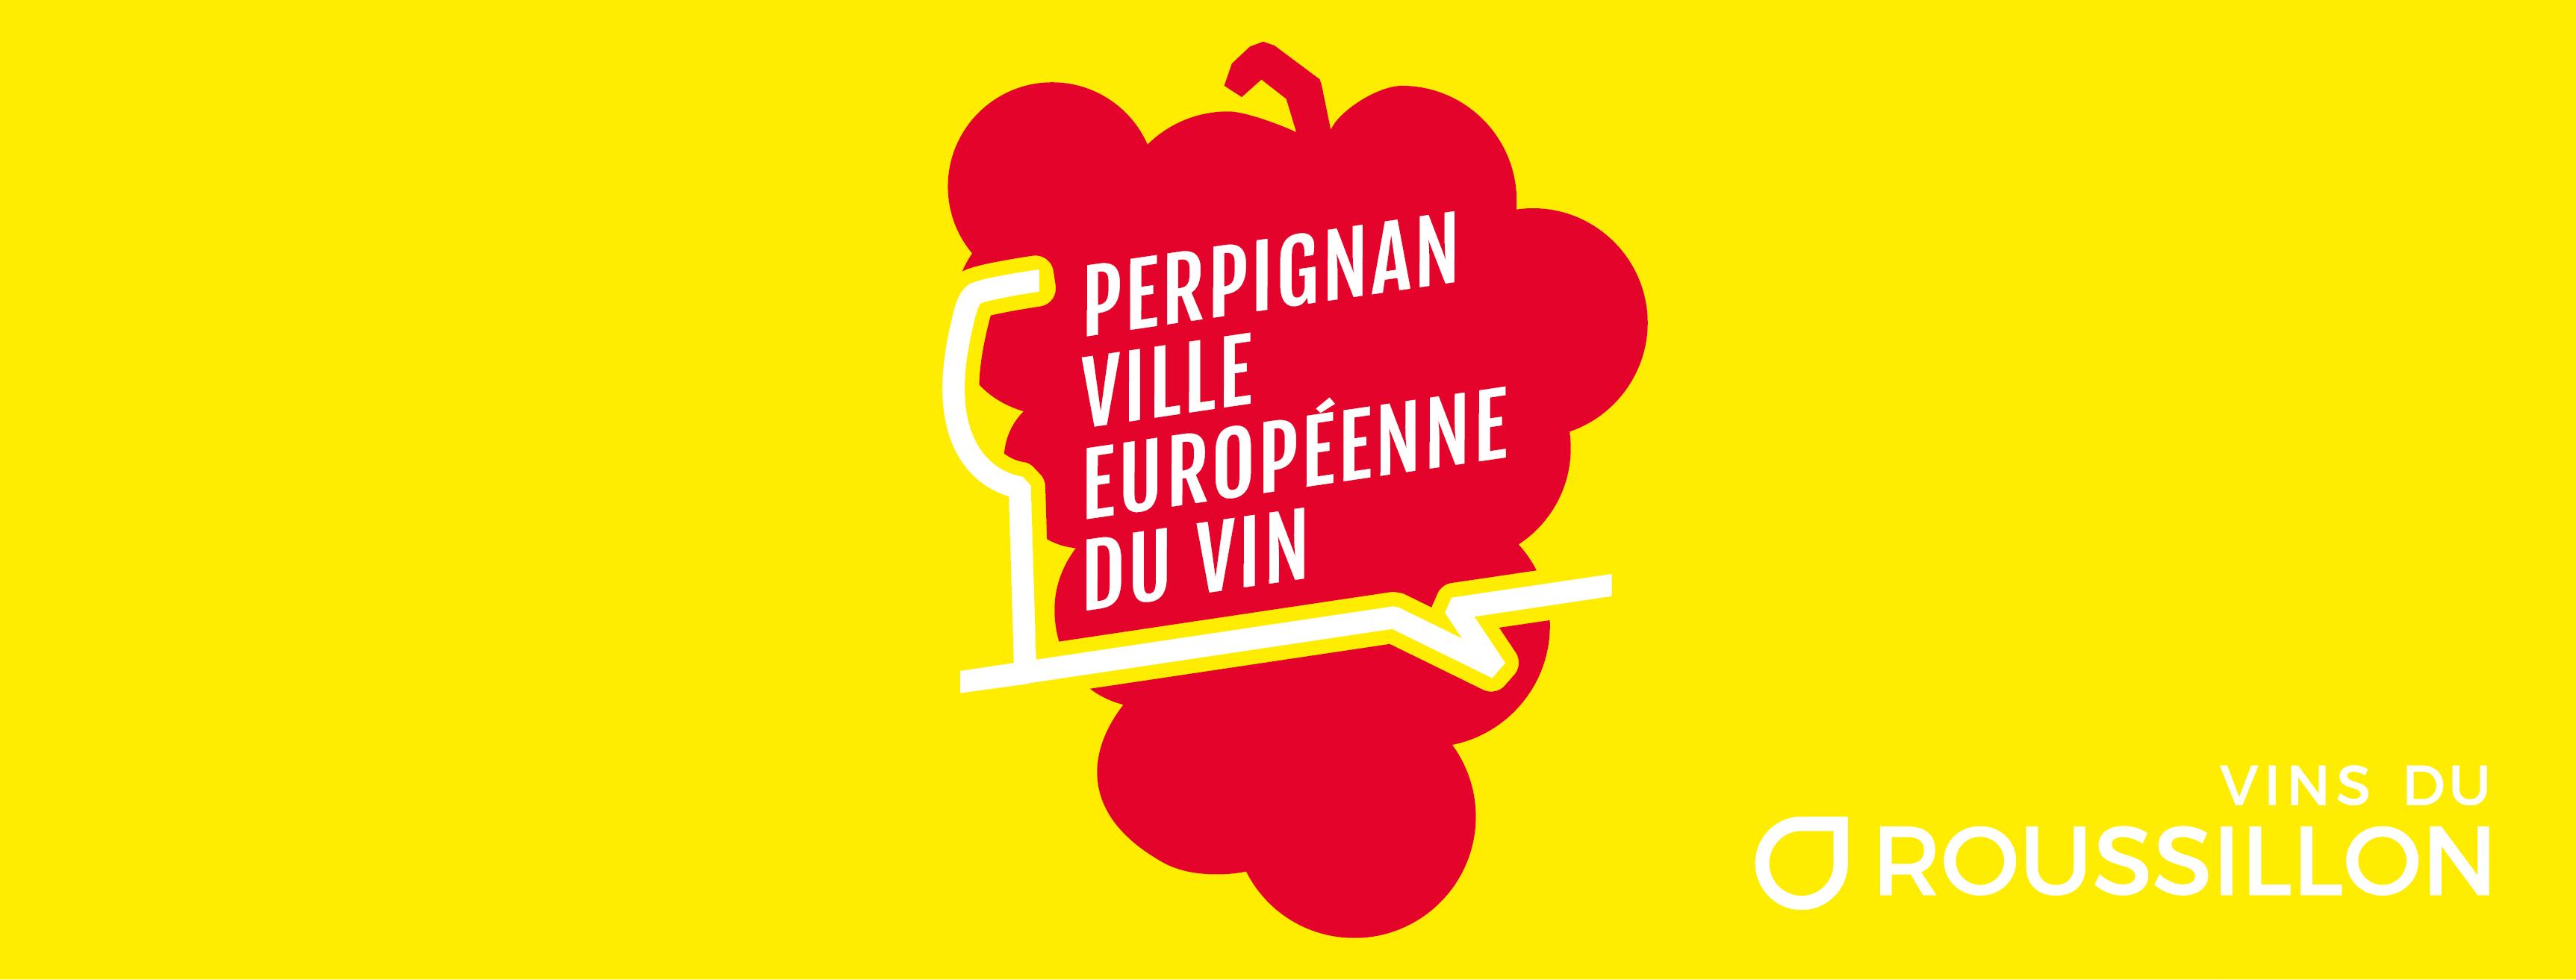 Les Ambassadeurs Ville Européenne du Vin